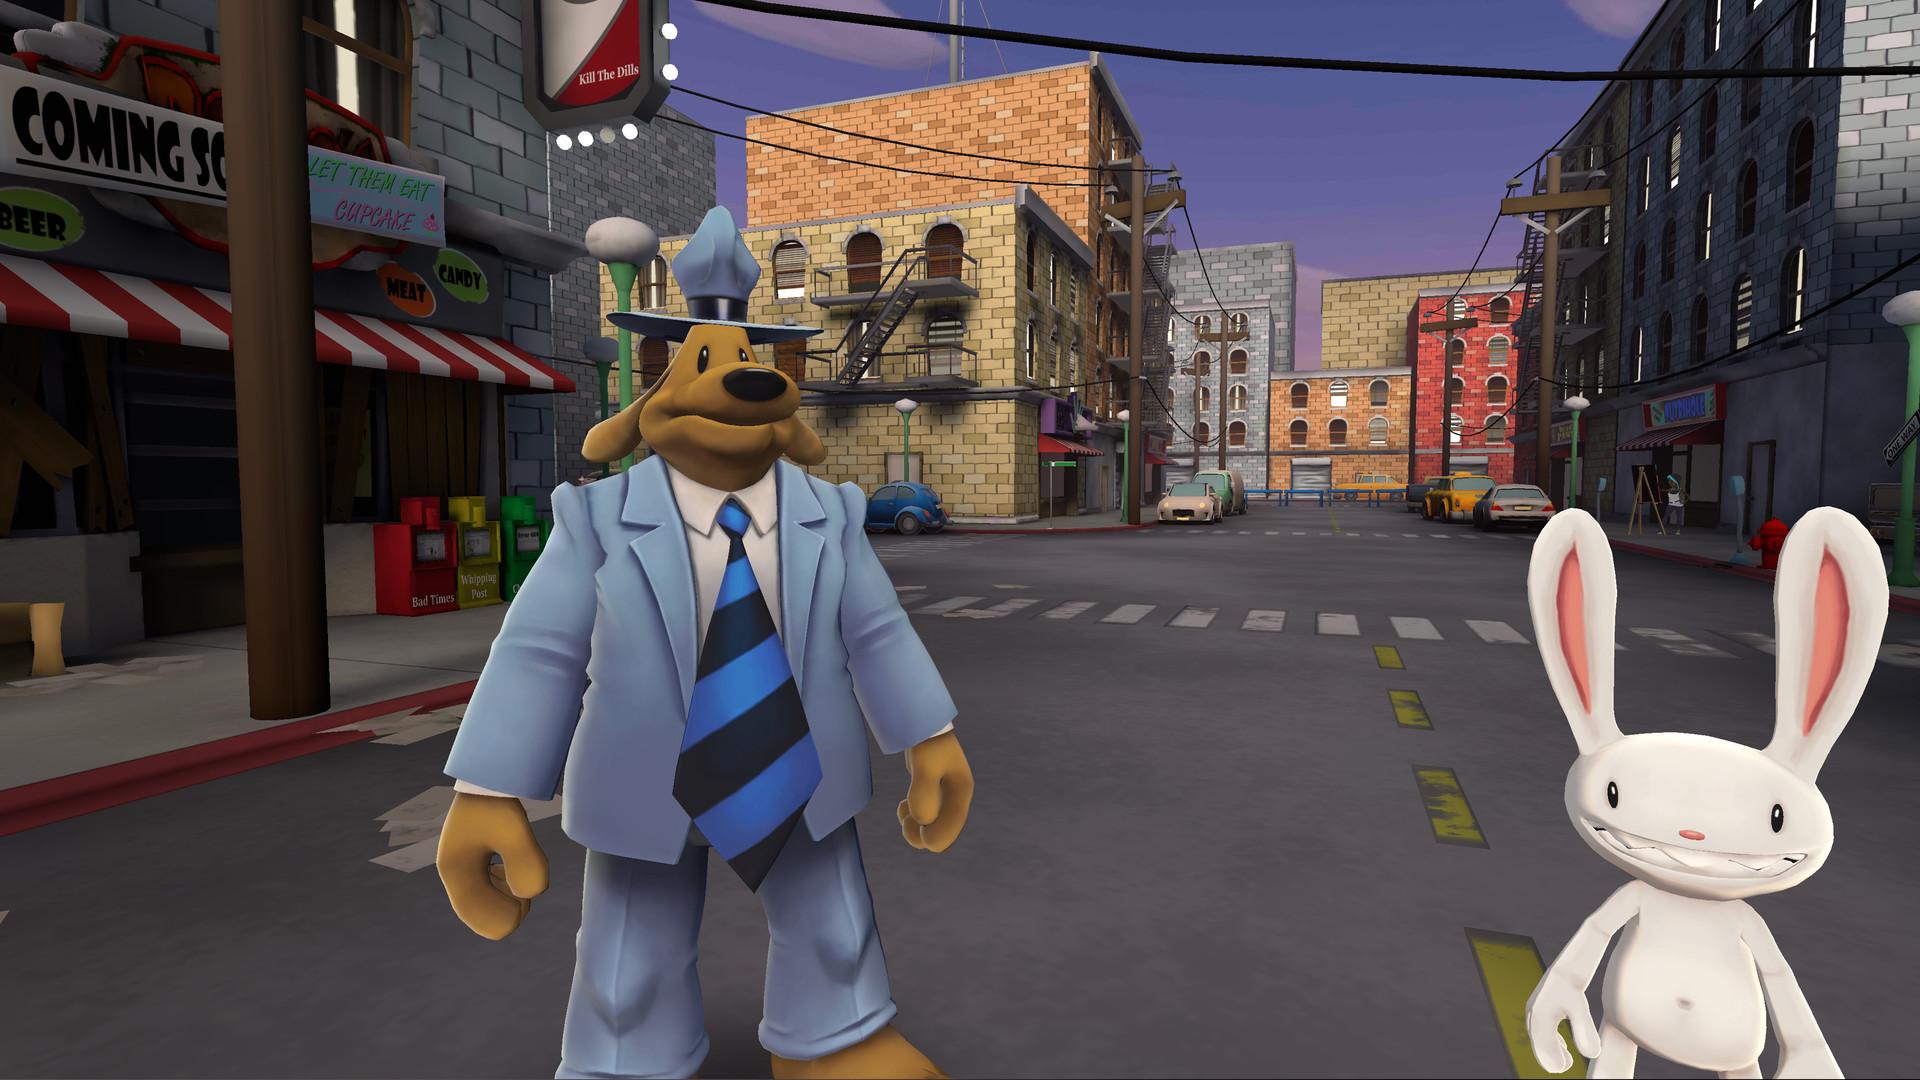 Oculus Quest 游戏《Sam & Max: This Time It's Virtual!》山姆和麦克斯:虚拟警探插图(3)